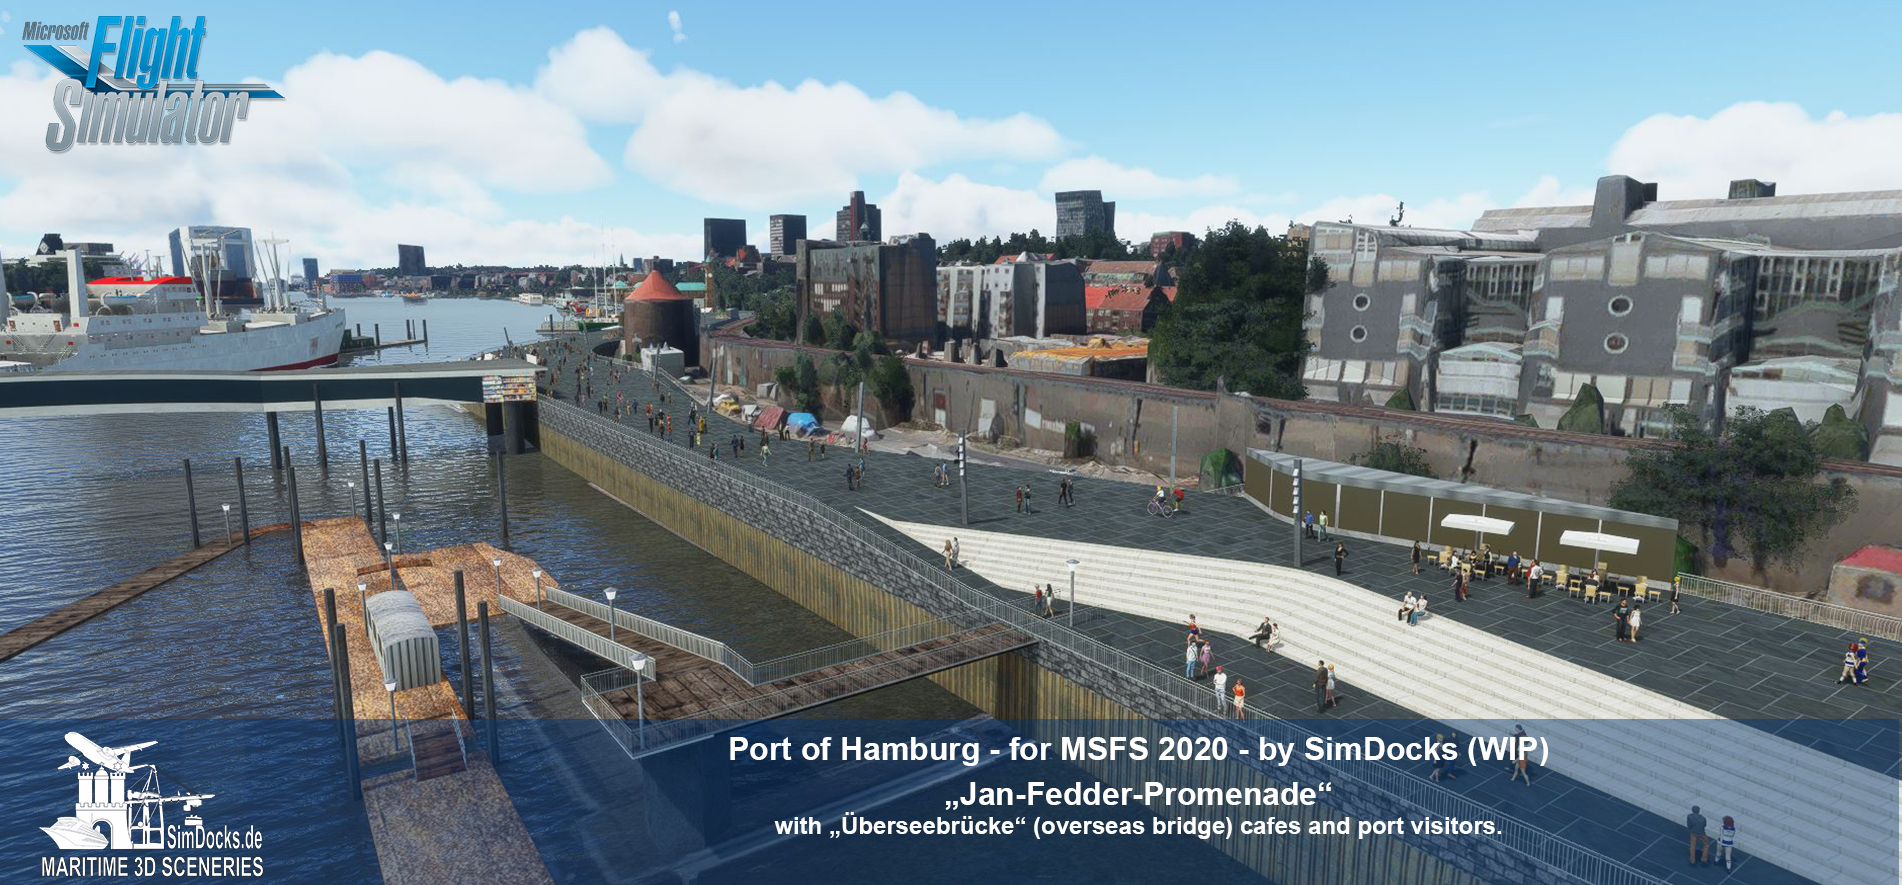 Bild82_Jan-Fedder-Promenade.jpg